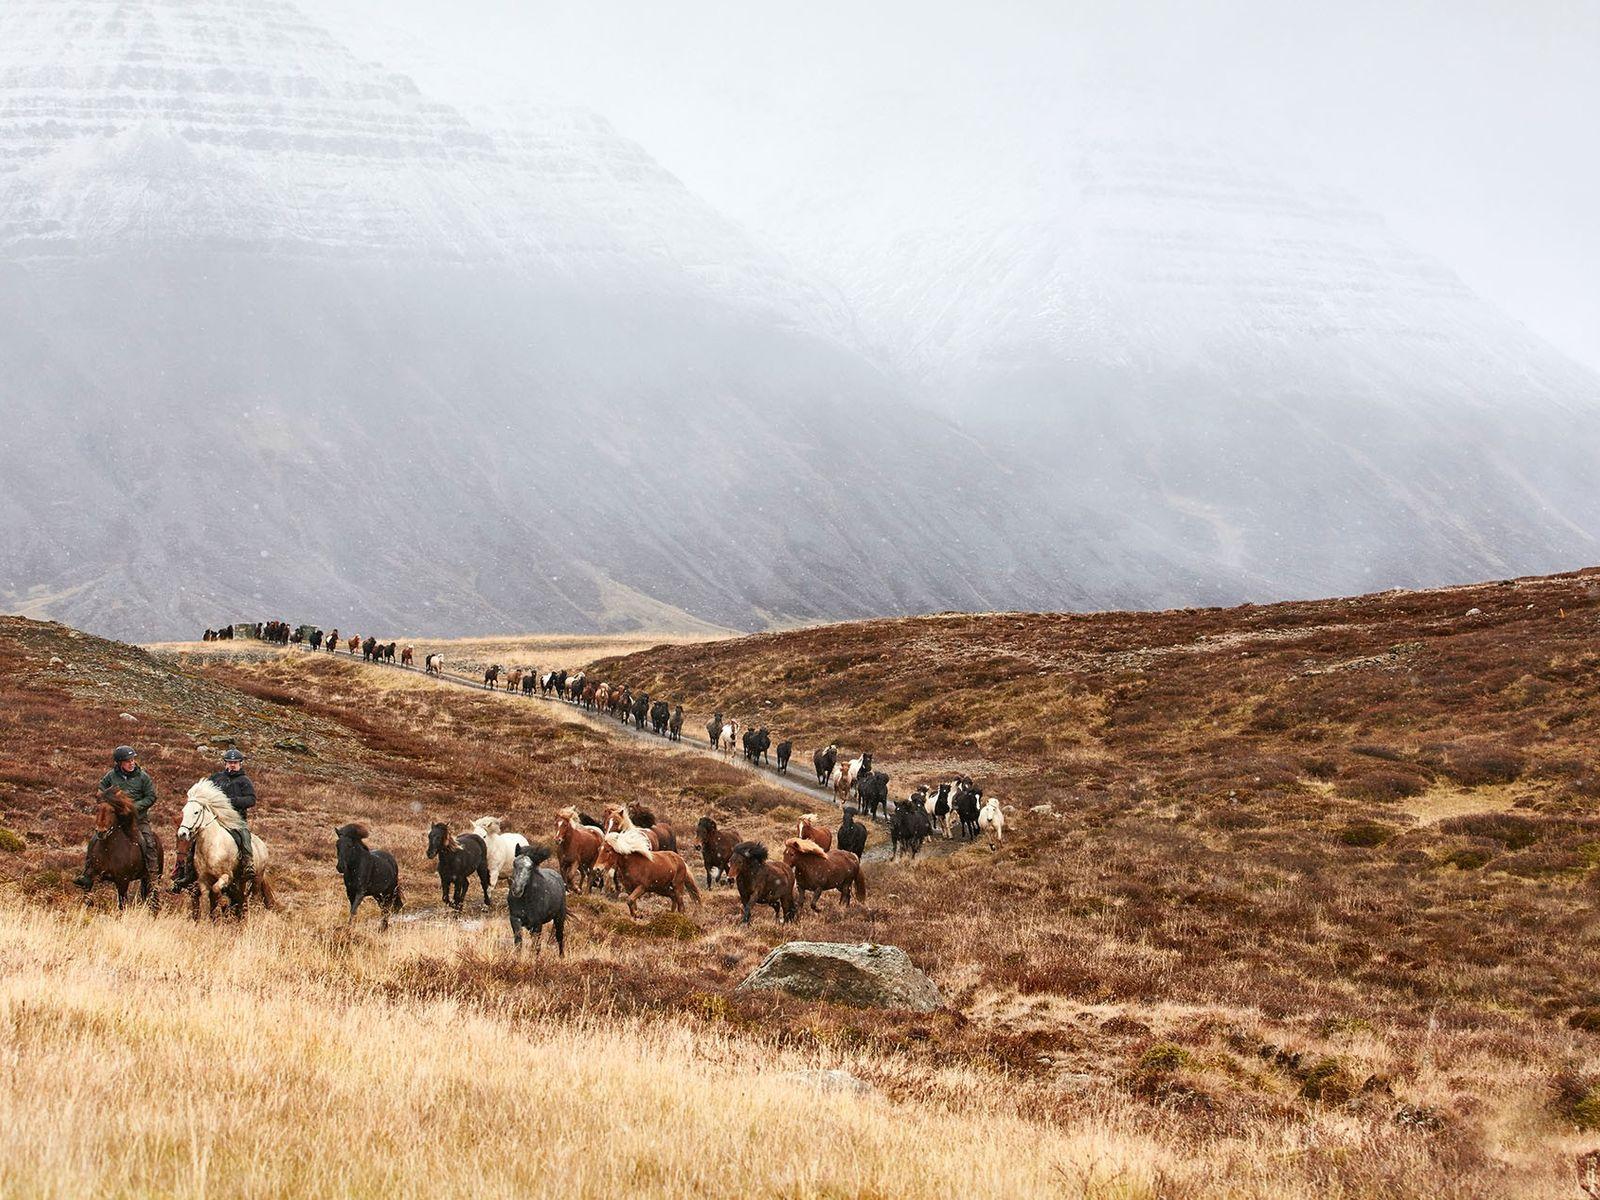 The annual Laufskálarétt horse round up inIceland's Kolbeinsdalur Valley.